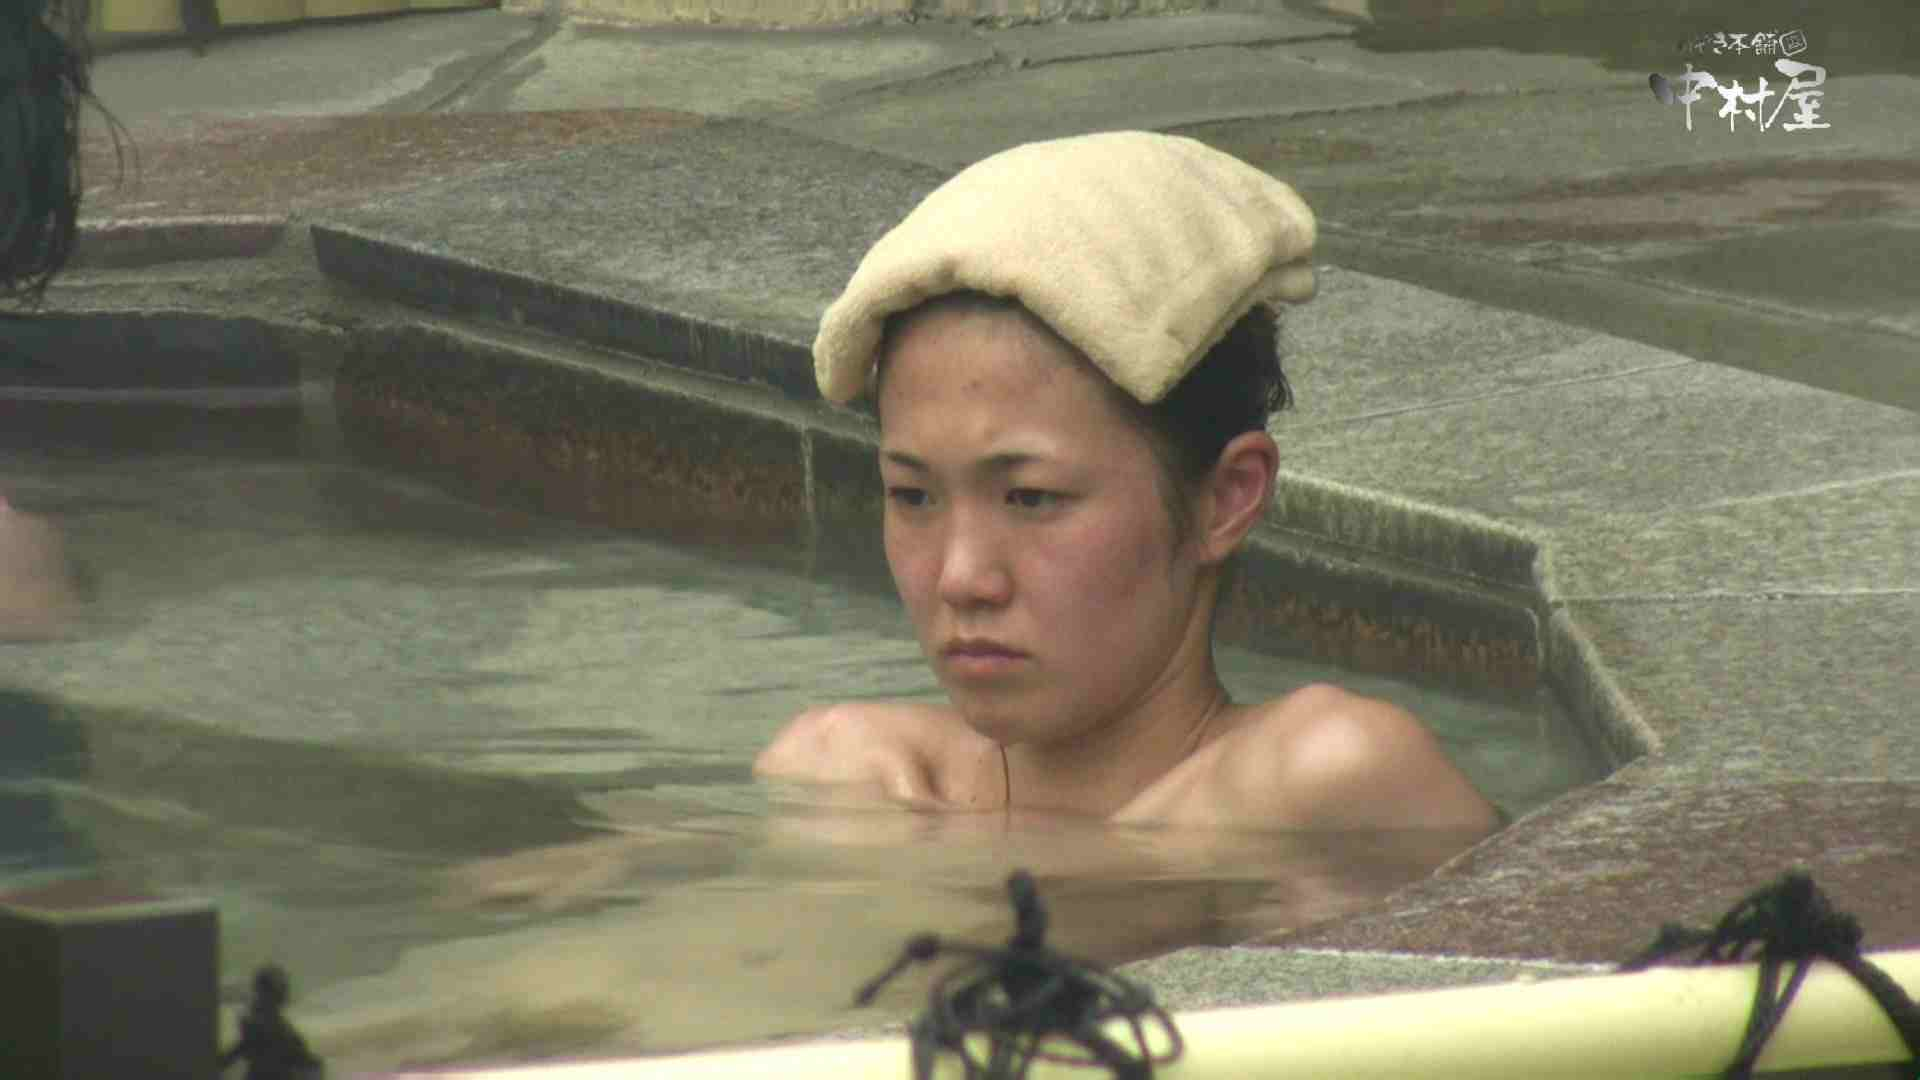 Aquaな露天風呂Vol.889 0  87連発 80